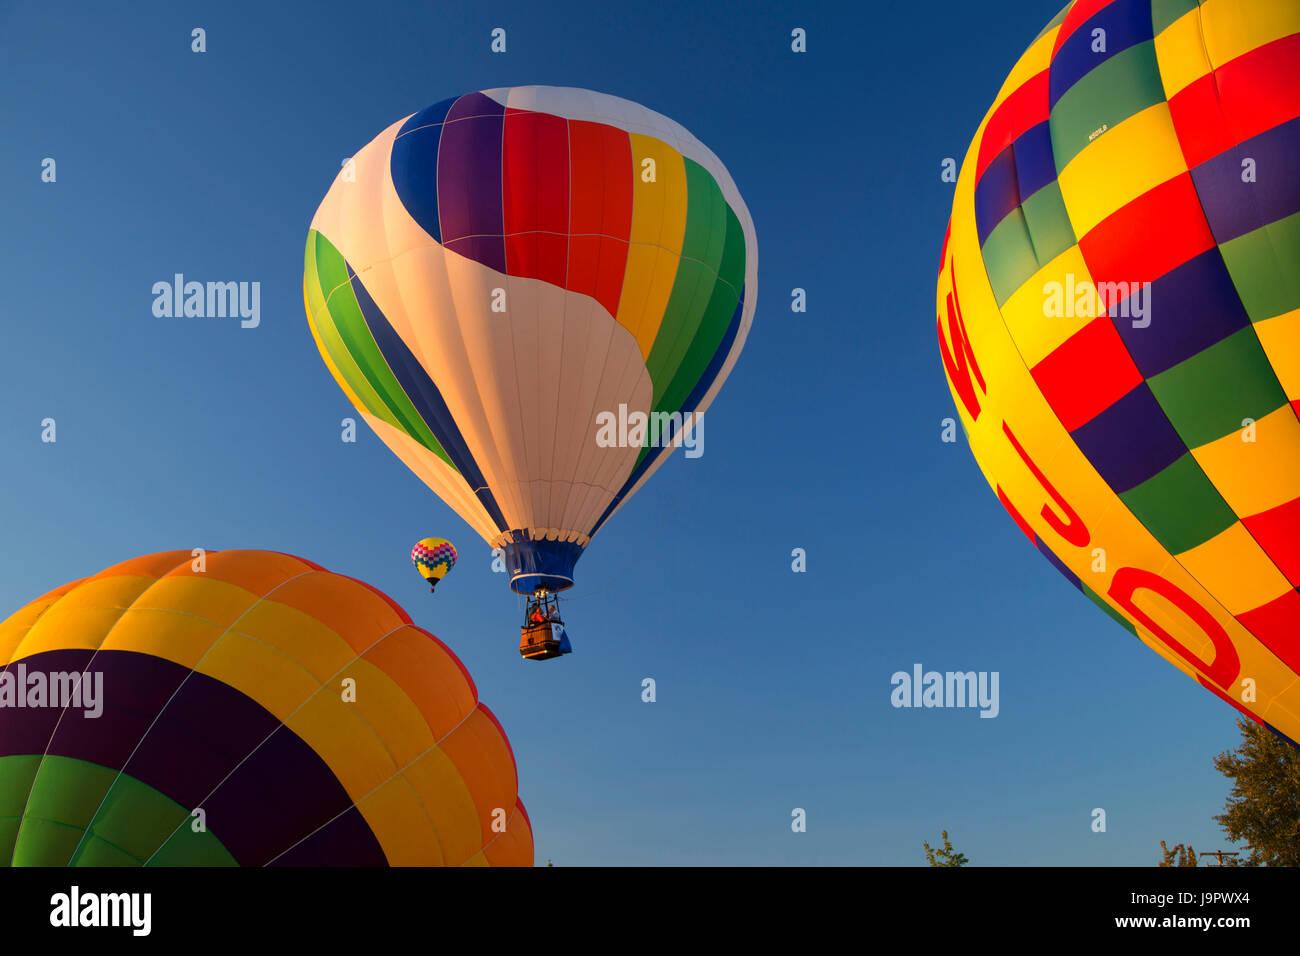 Hot air balloon, Northwest Art and Air Festival, Timber Linn Park, Albany, Oregon - Stock Image